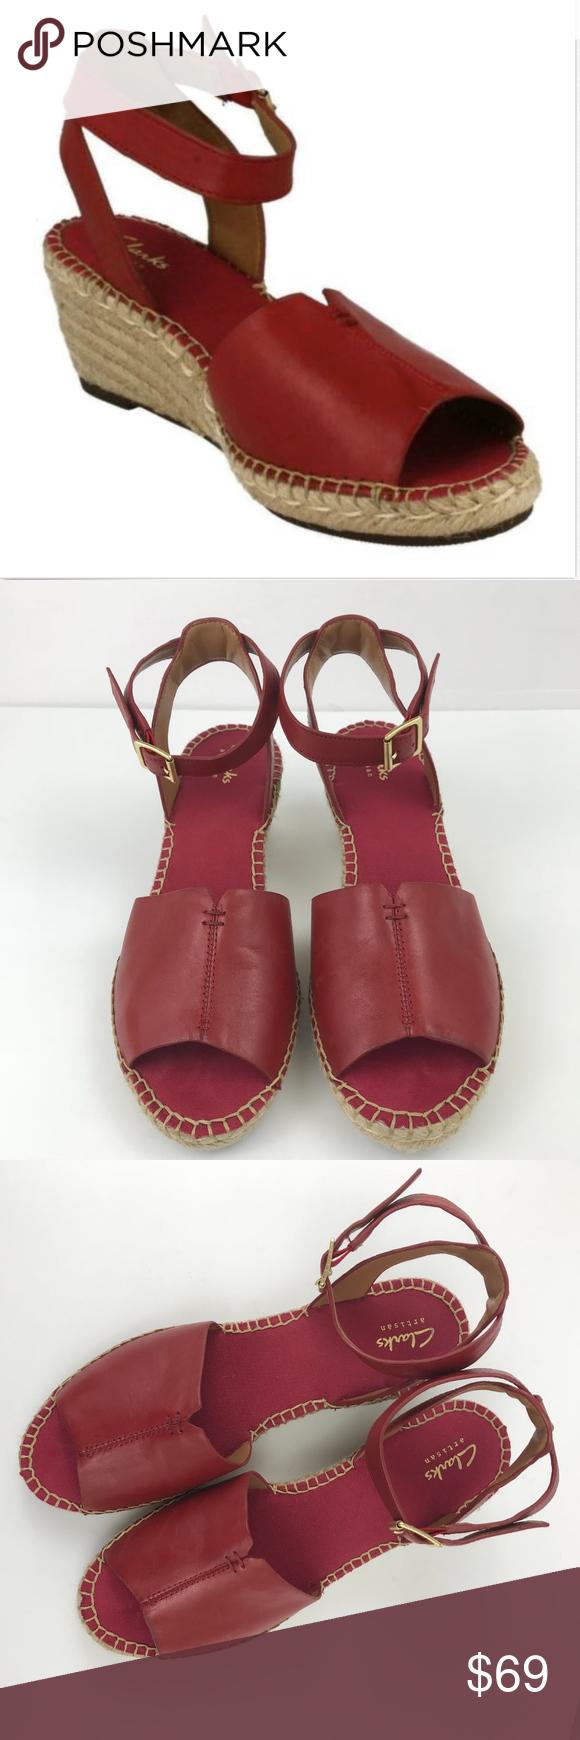 f1ee7f8bff8 Clarks Sandals Petrina Selma Wedge Espadrille Clarks Women s Sandals Petrina  Selma Red Leather Wedge Espadrille Ankle